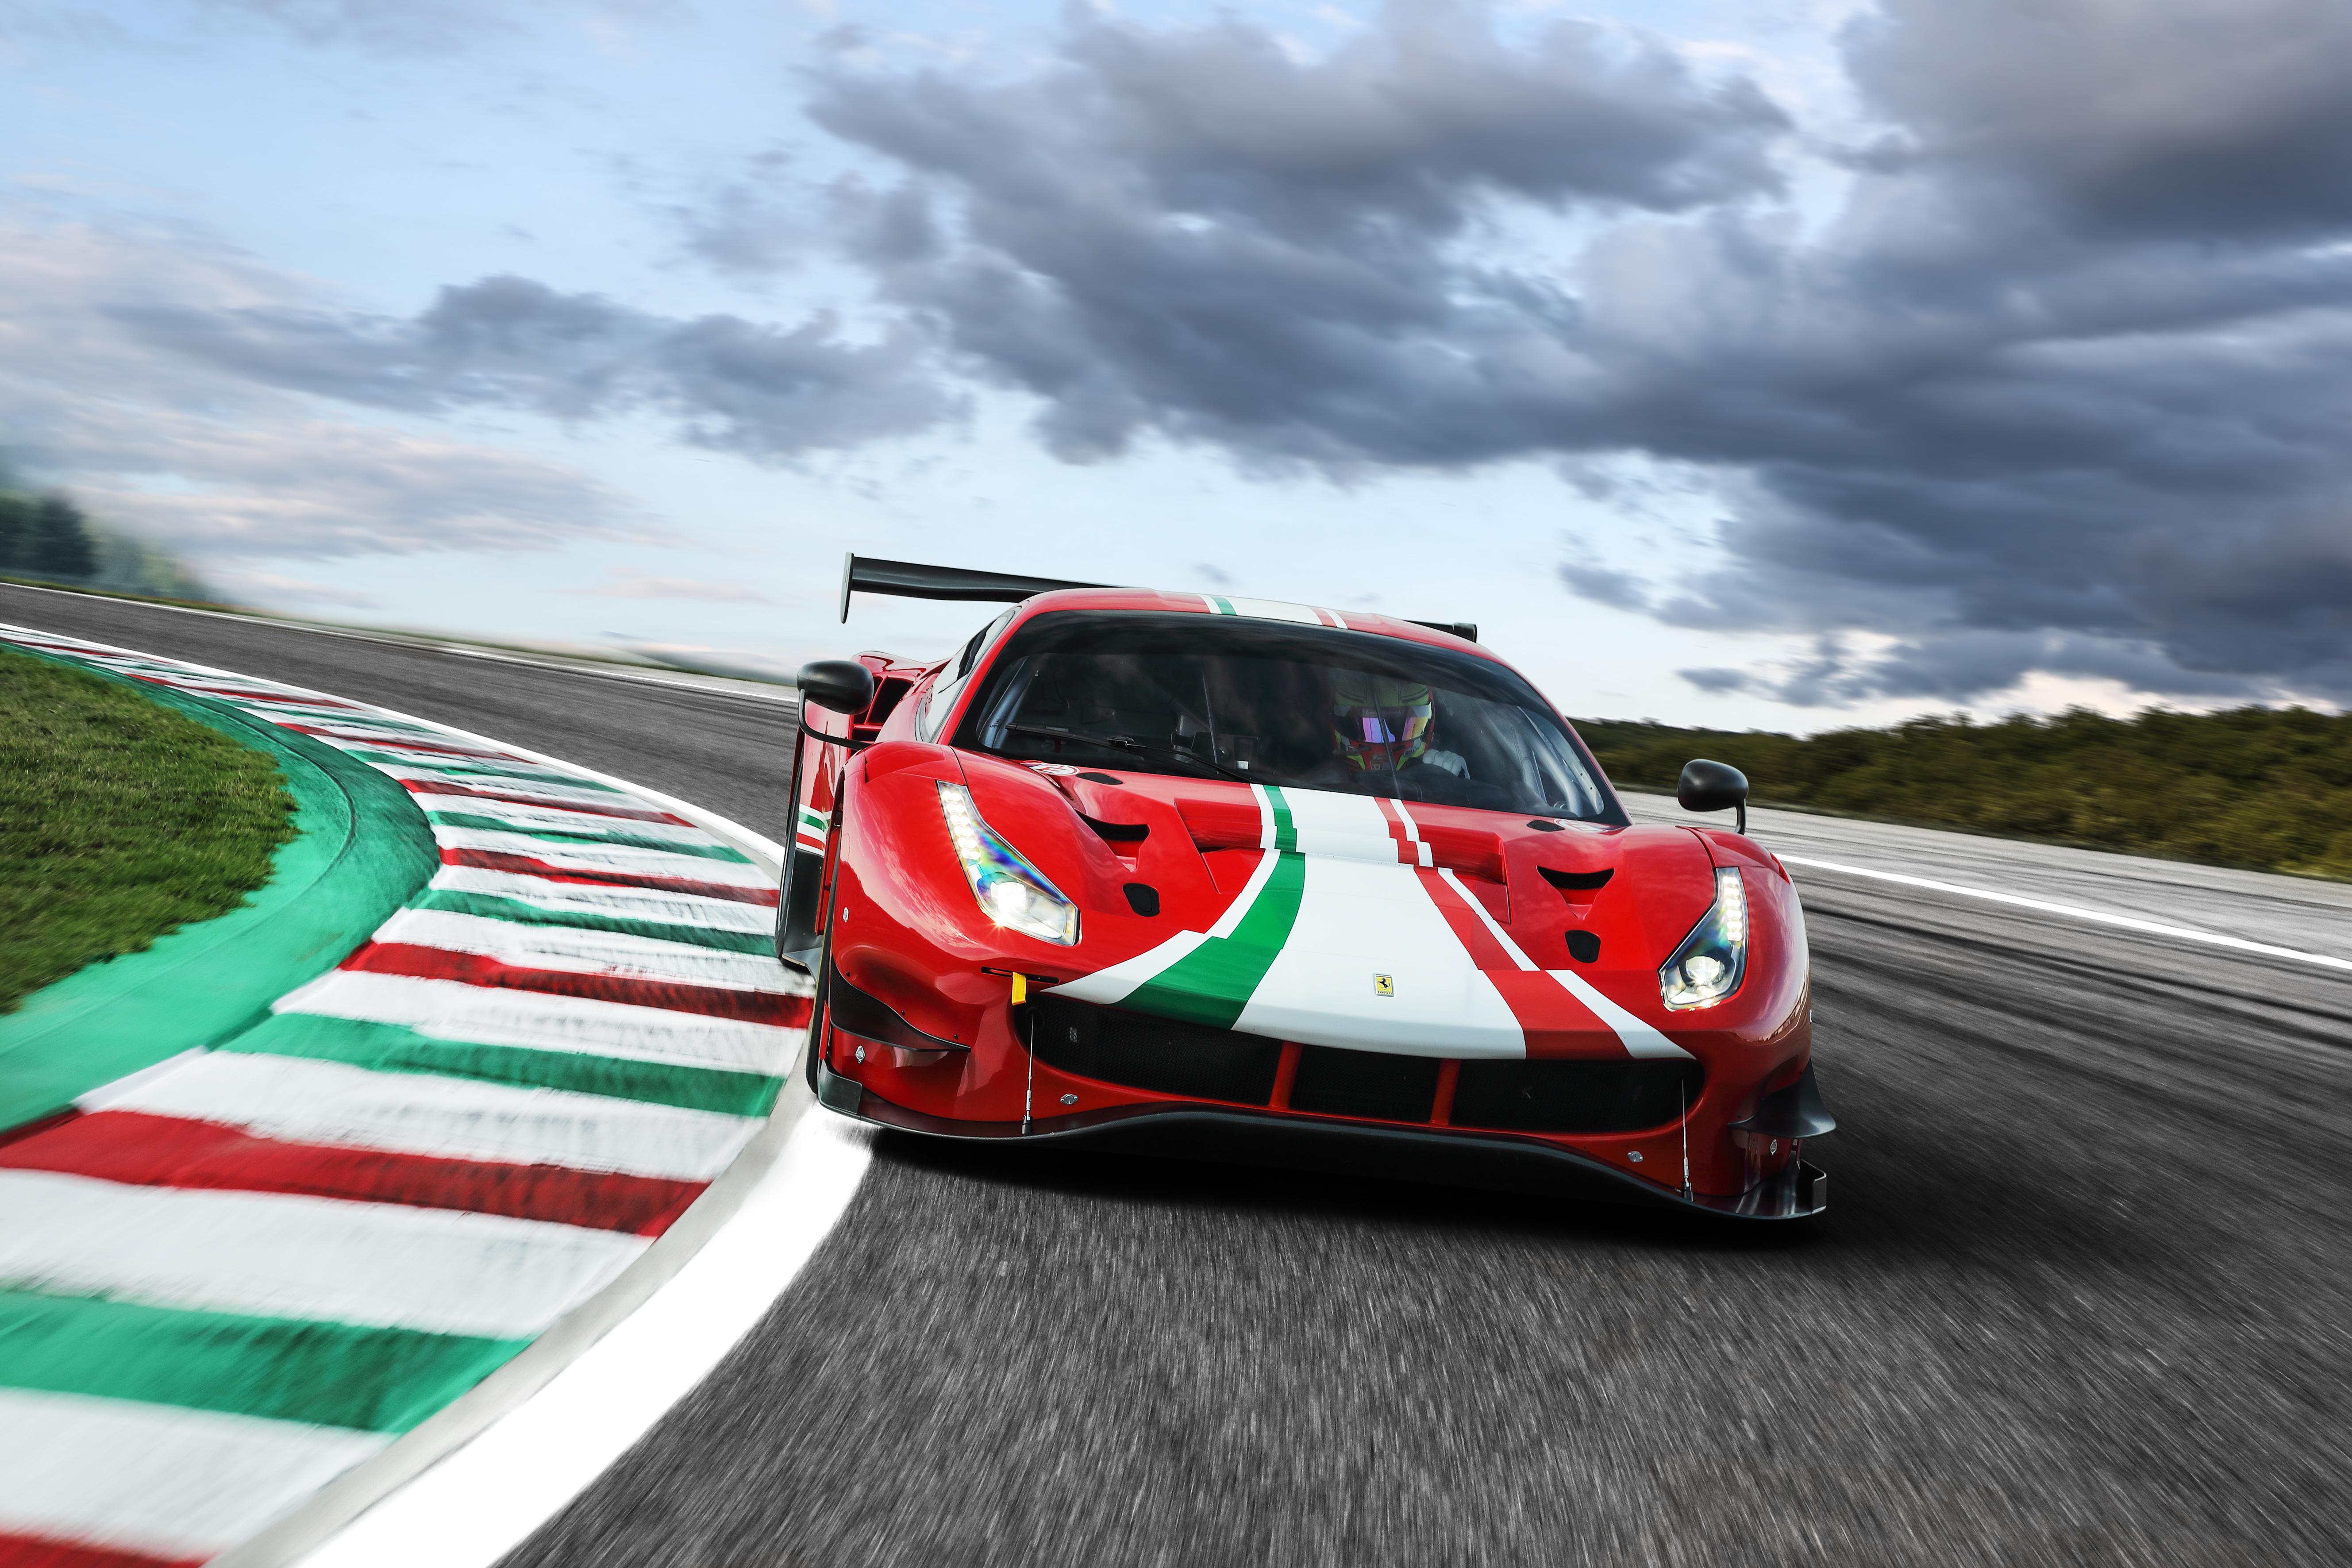 2020 ferrari 488 gt3 evo 1574936163 - 2020 Ferrari 488 GT3 Evo -